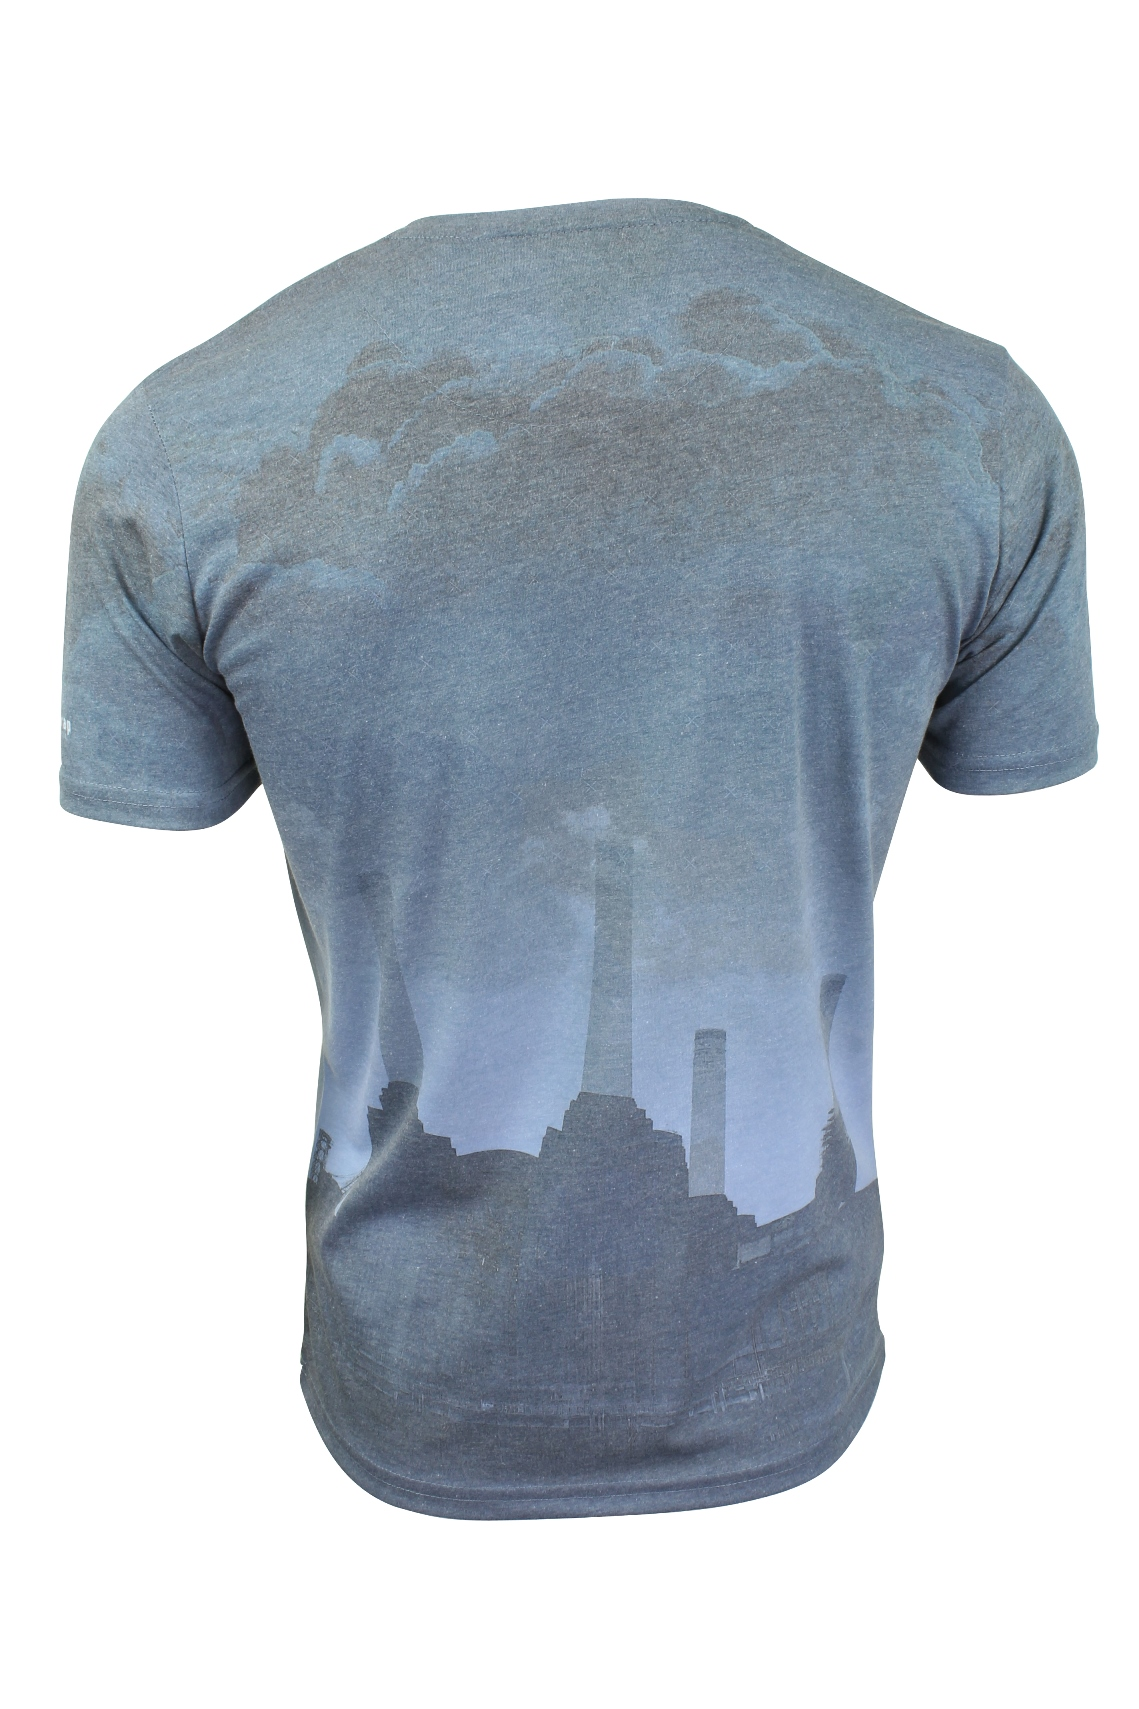 Mens T-Shirt by Firetrap /'Selah/' Battersea Power Station Print